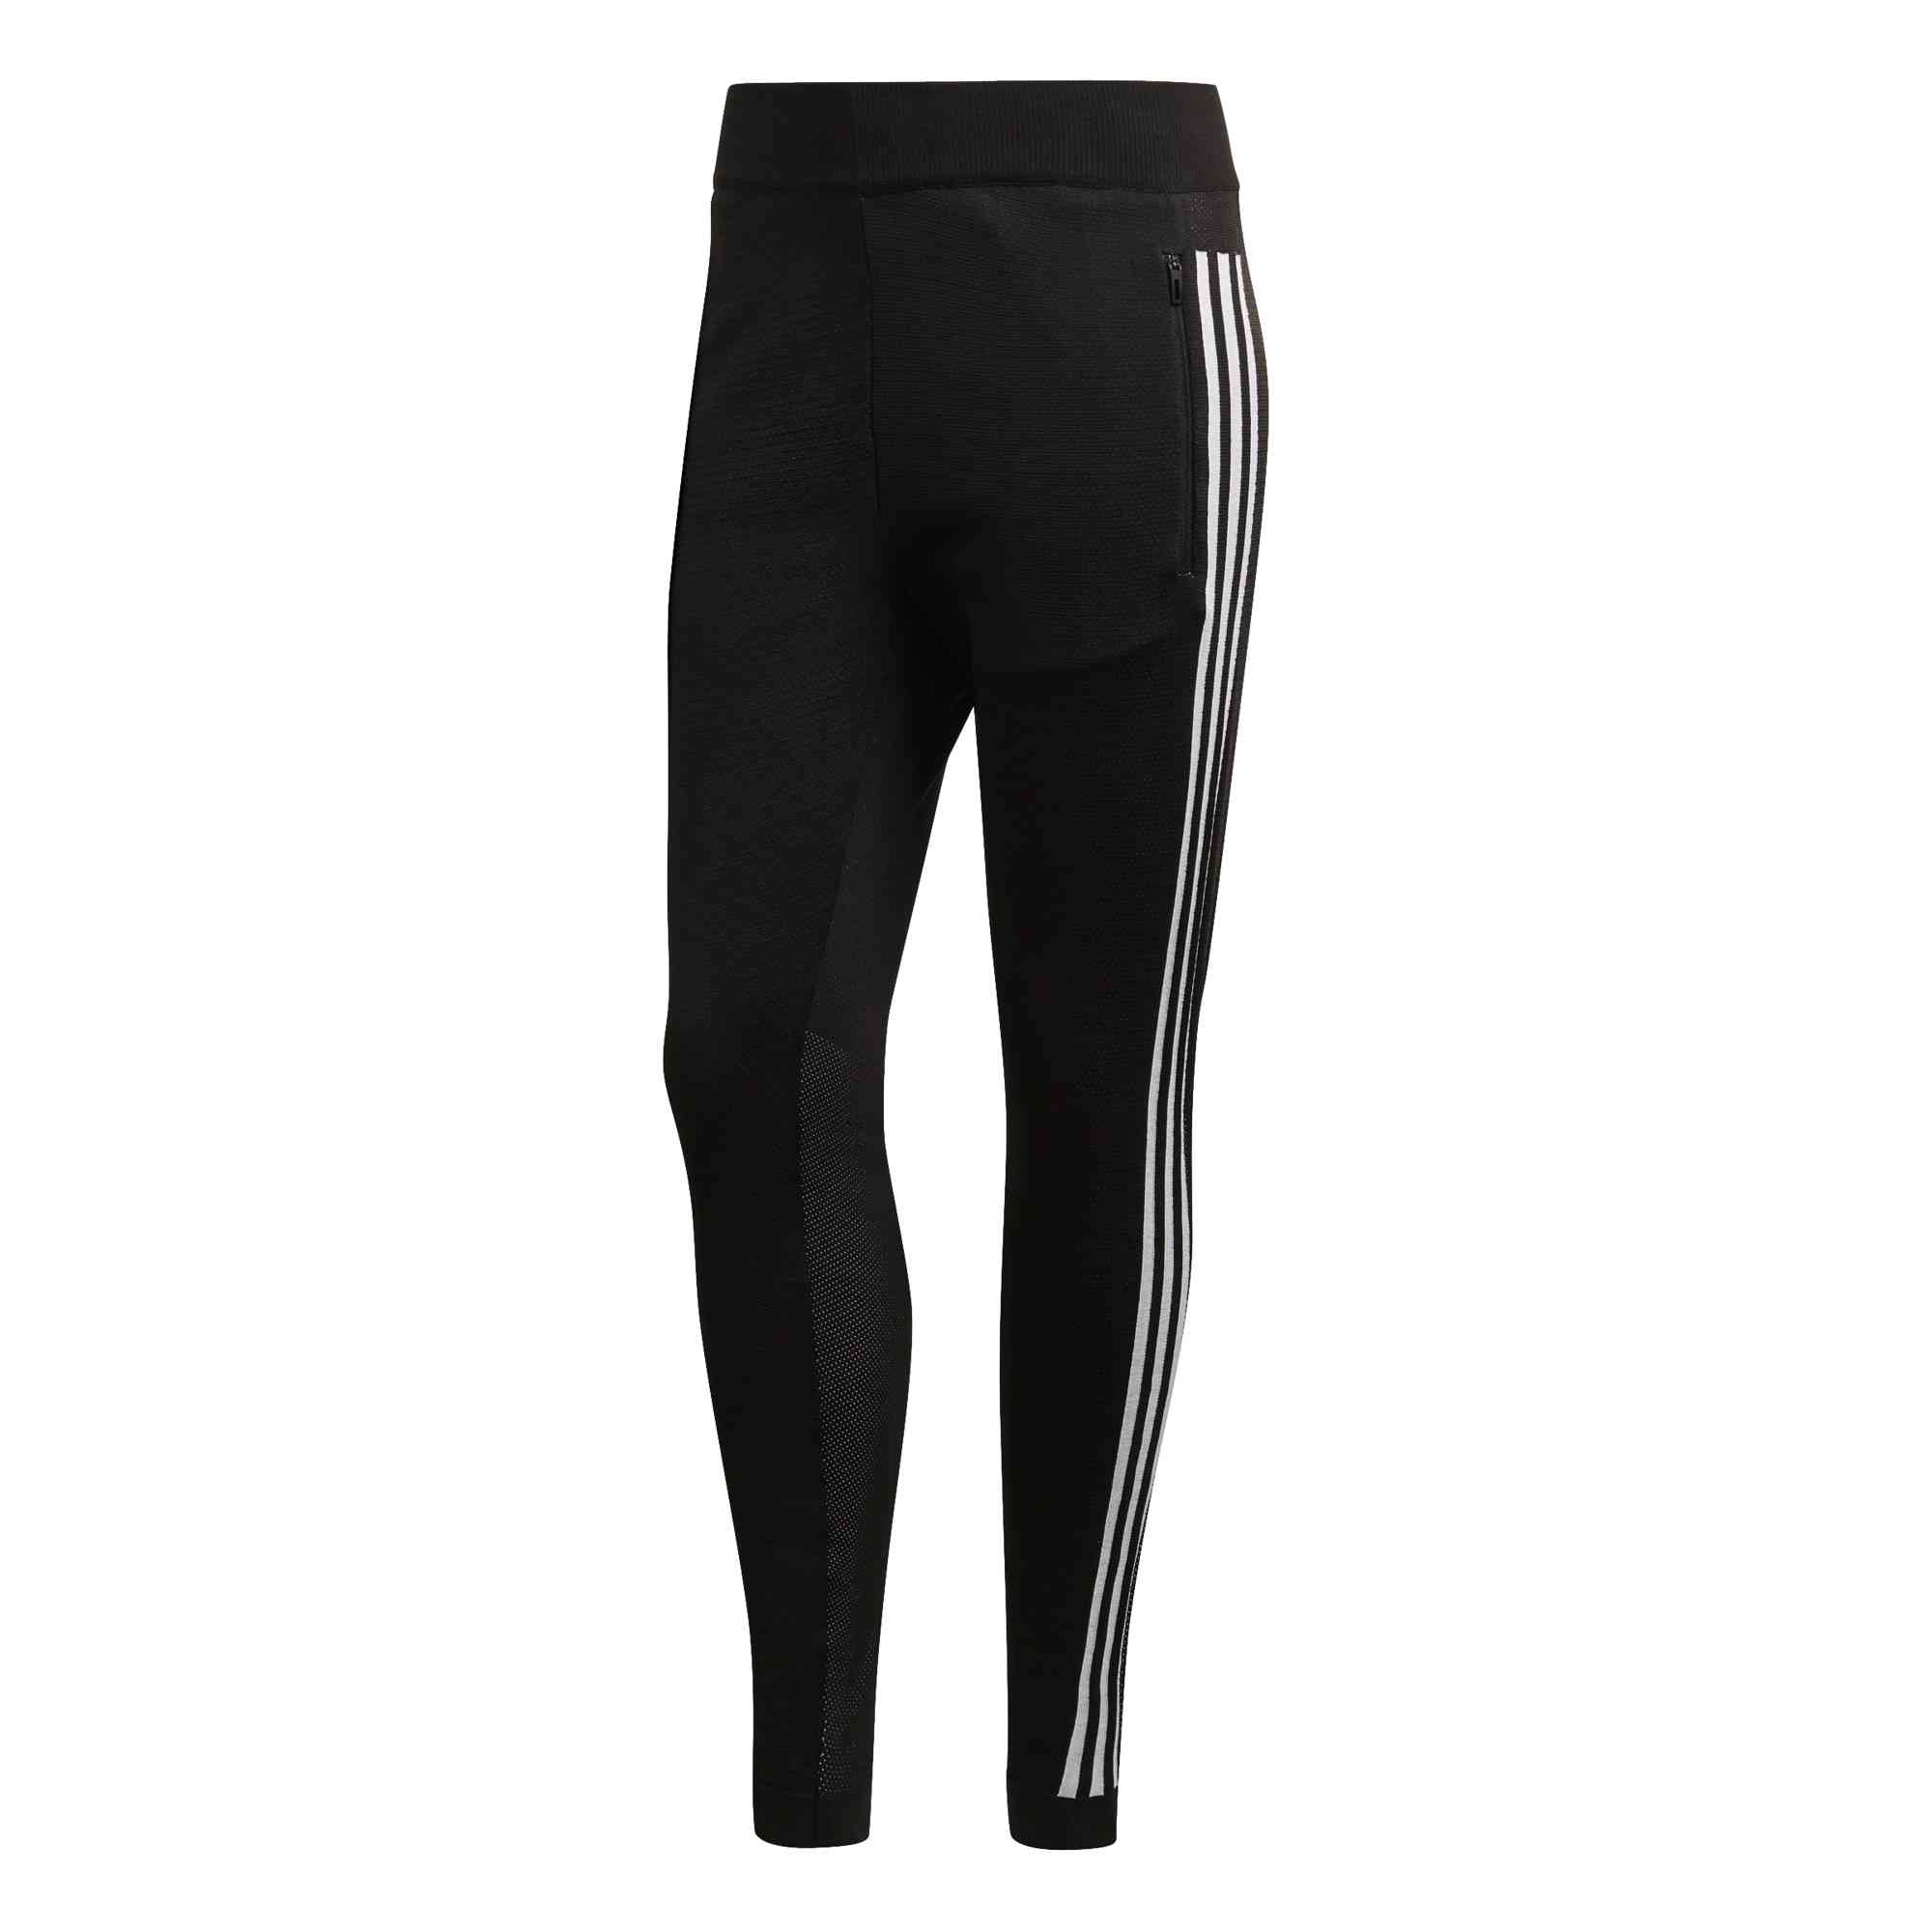 Adidas Ld Kn Stk Dames sportbroek